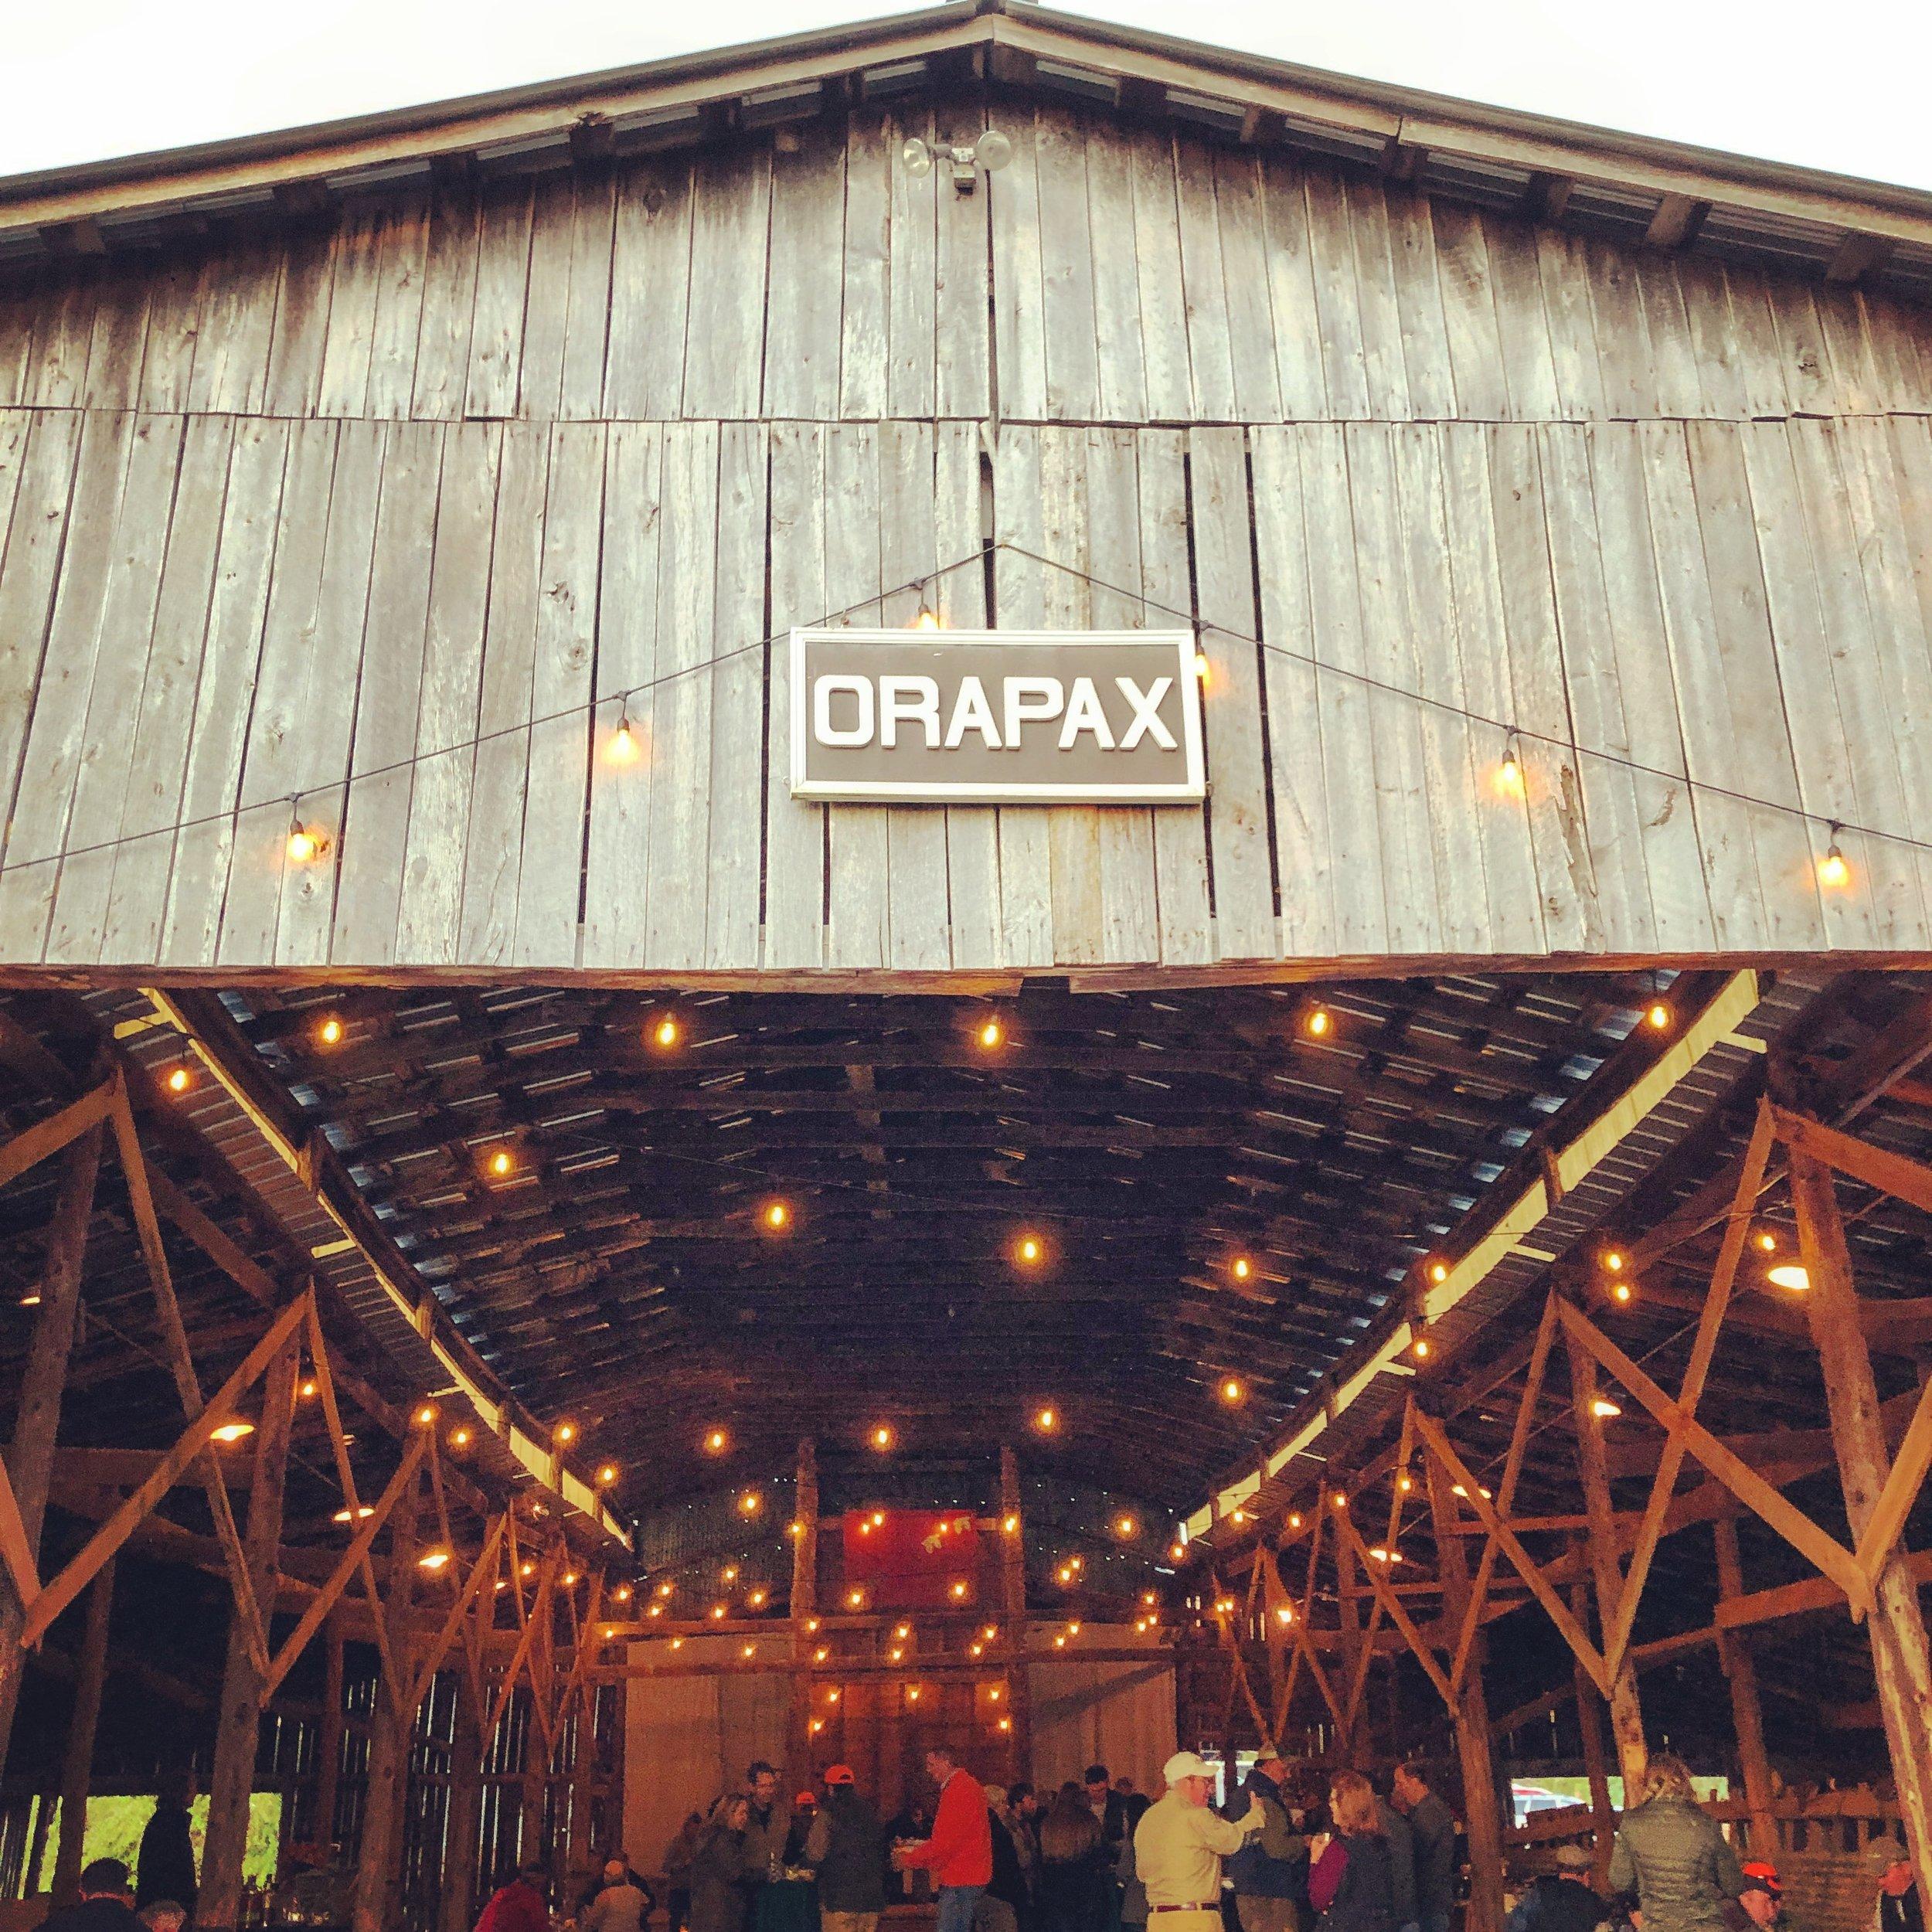 The Barn Warming: let the festivities begin!